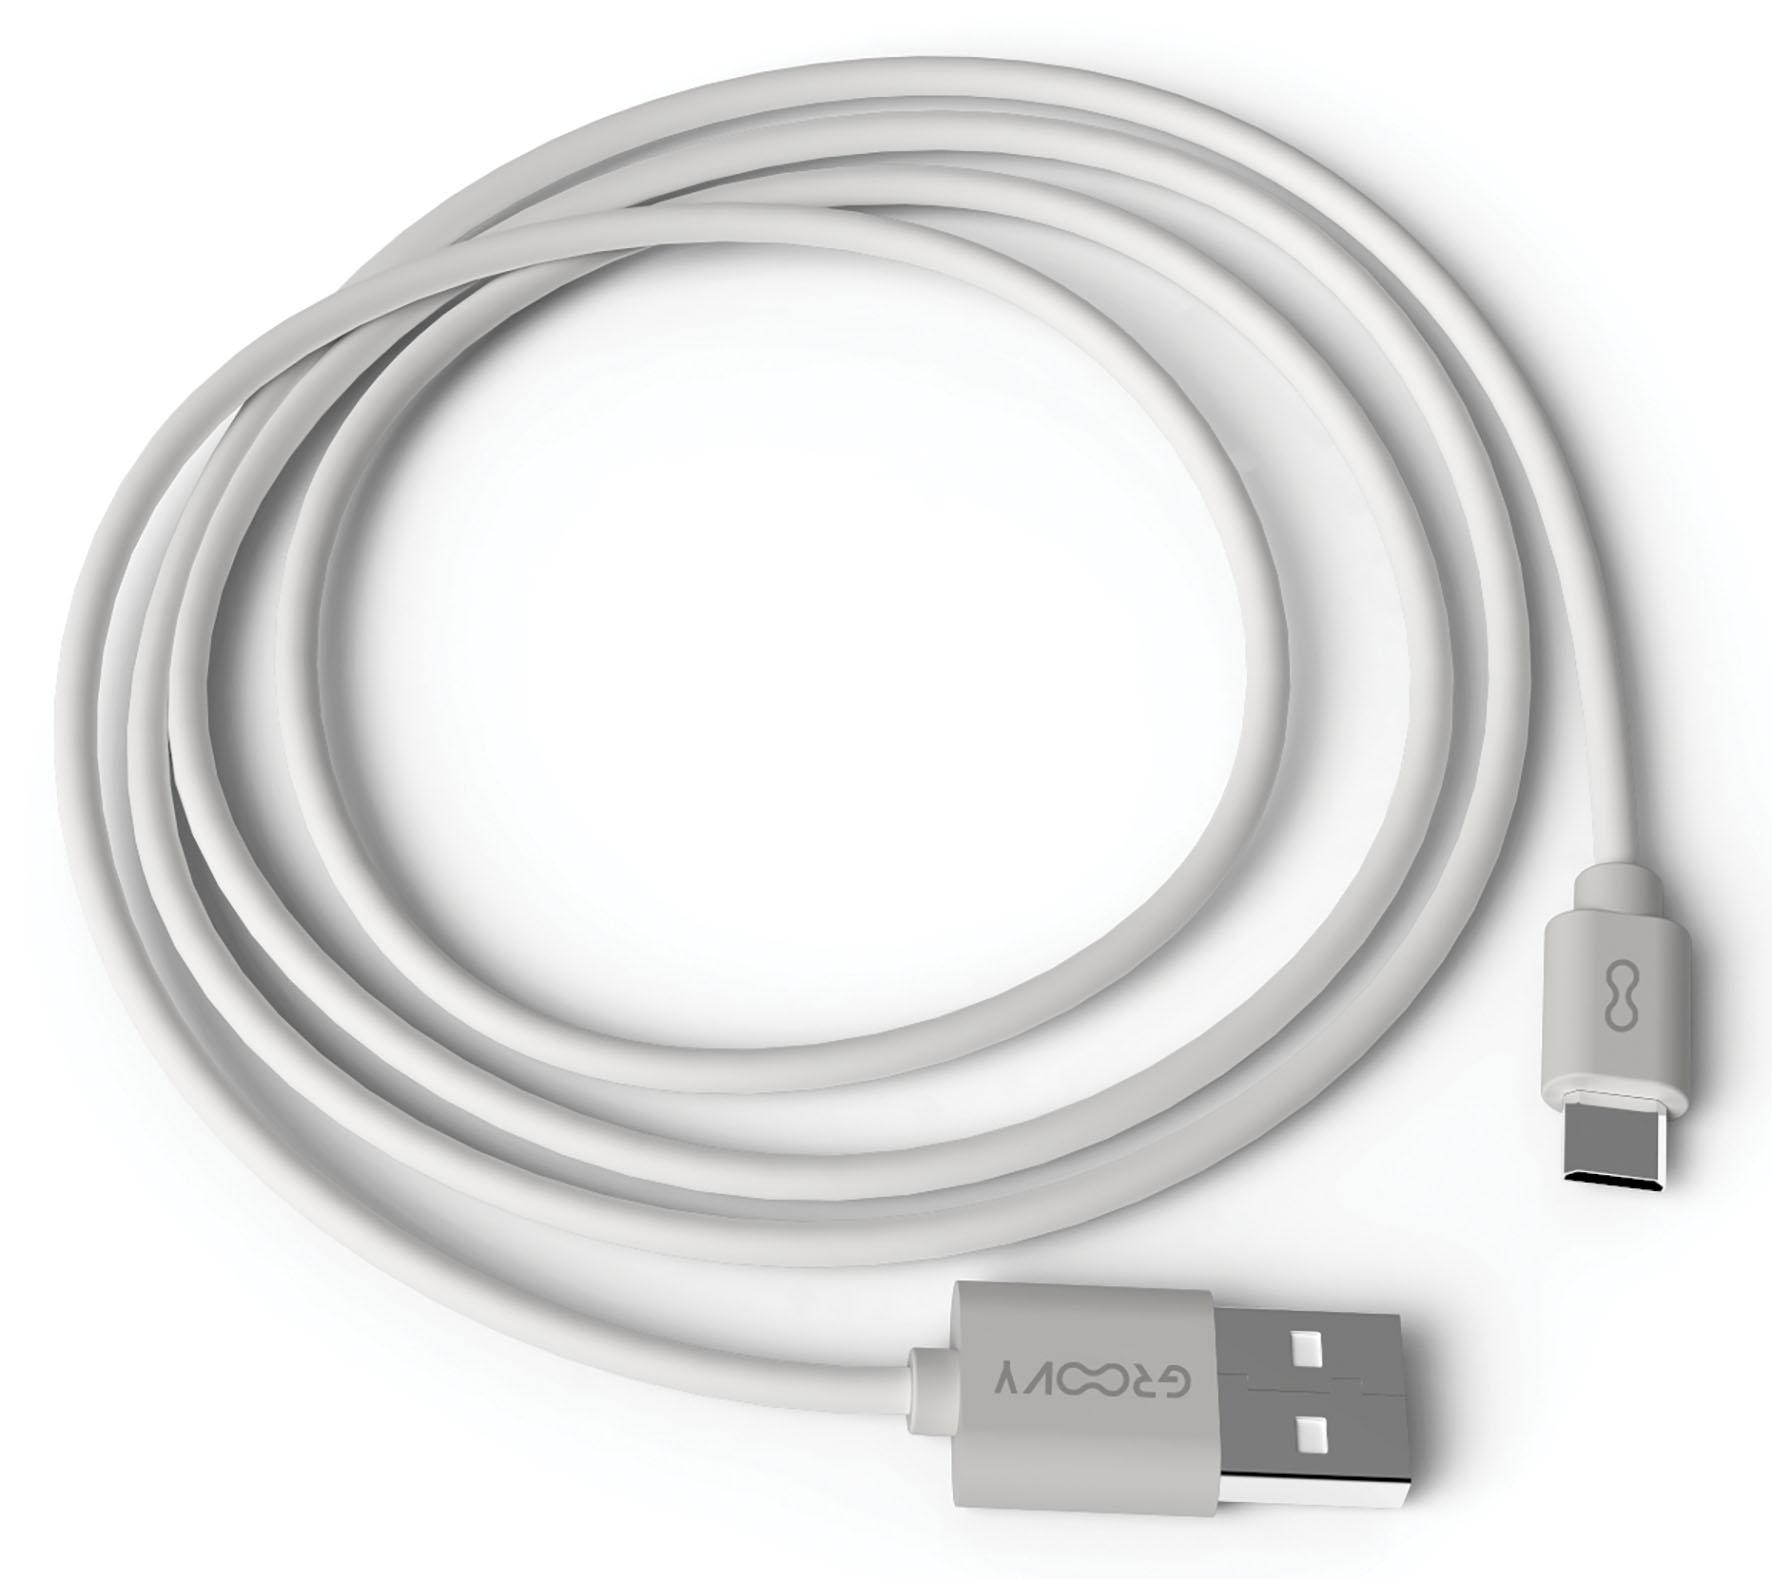 CAVO RICARICA MICRO USB 1 M